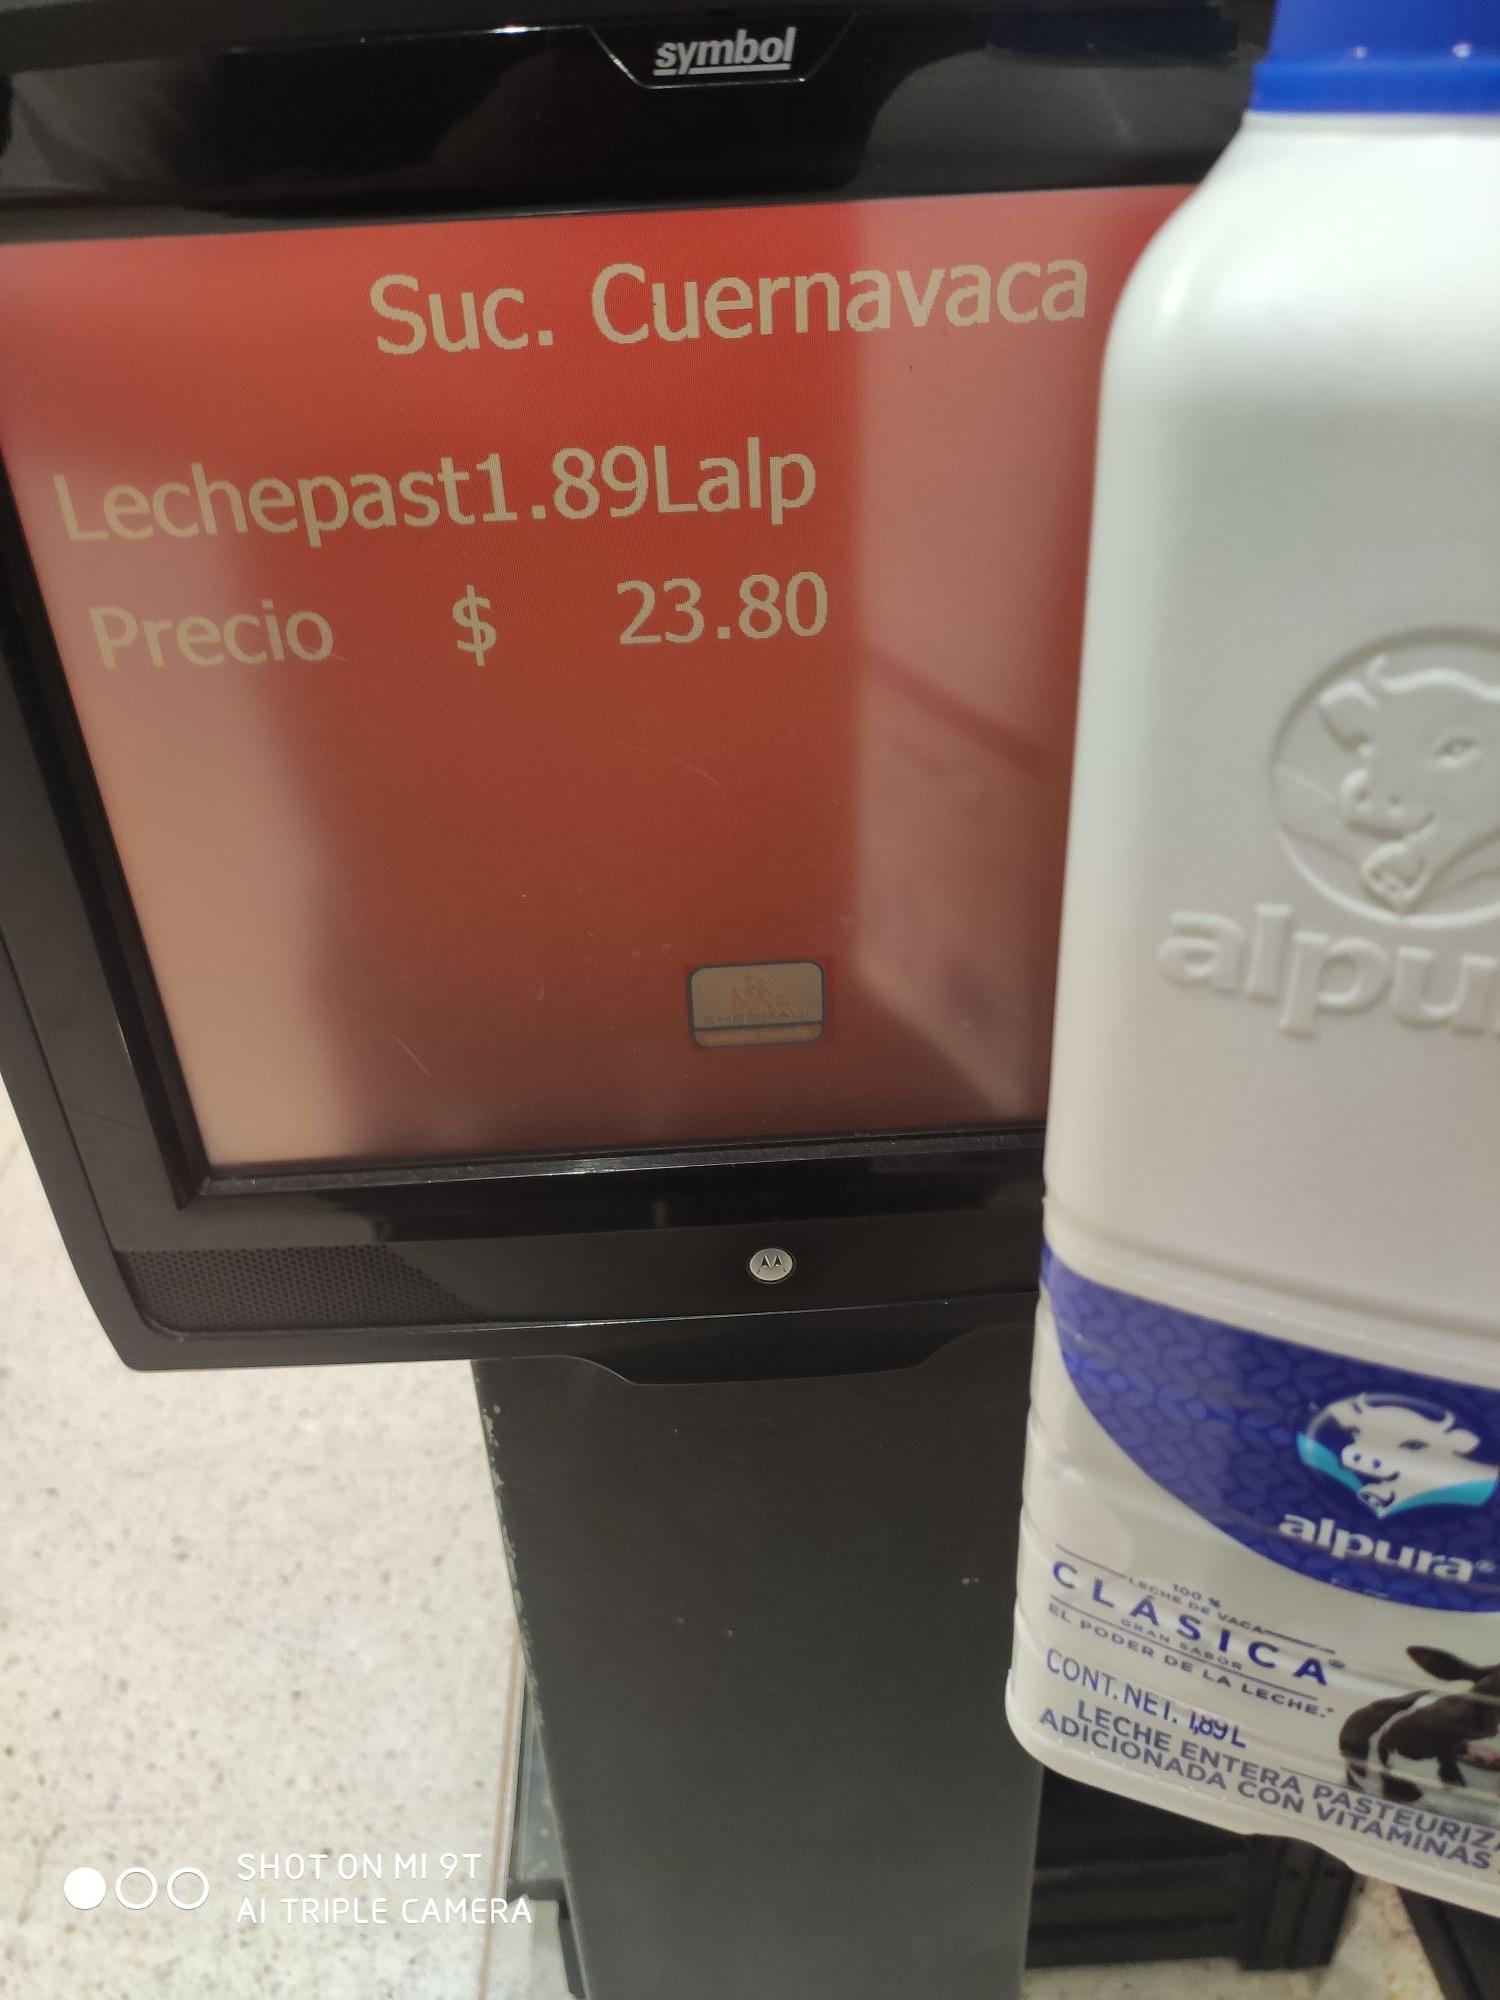 Chedraui: Leche alpura medio galón sucursal Cuernavaca